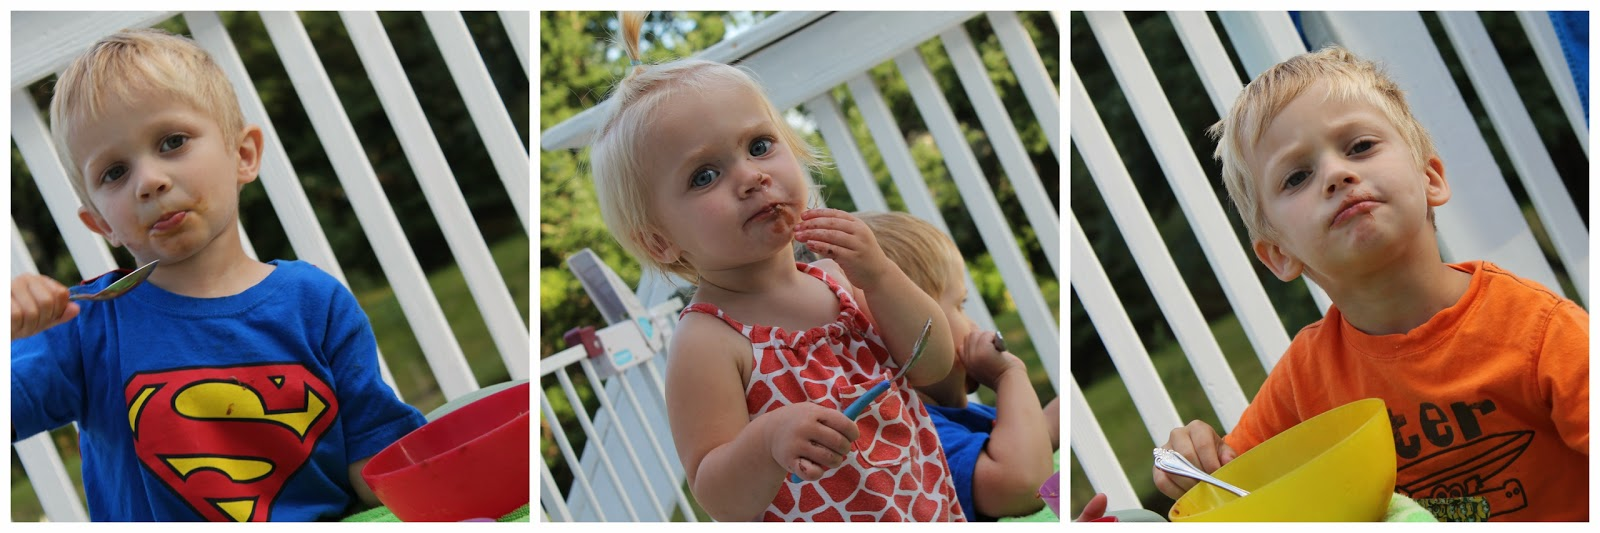 Walgreens Ice Cream : The Chirping Moms